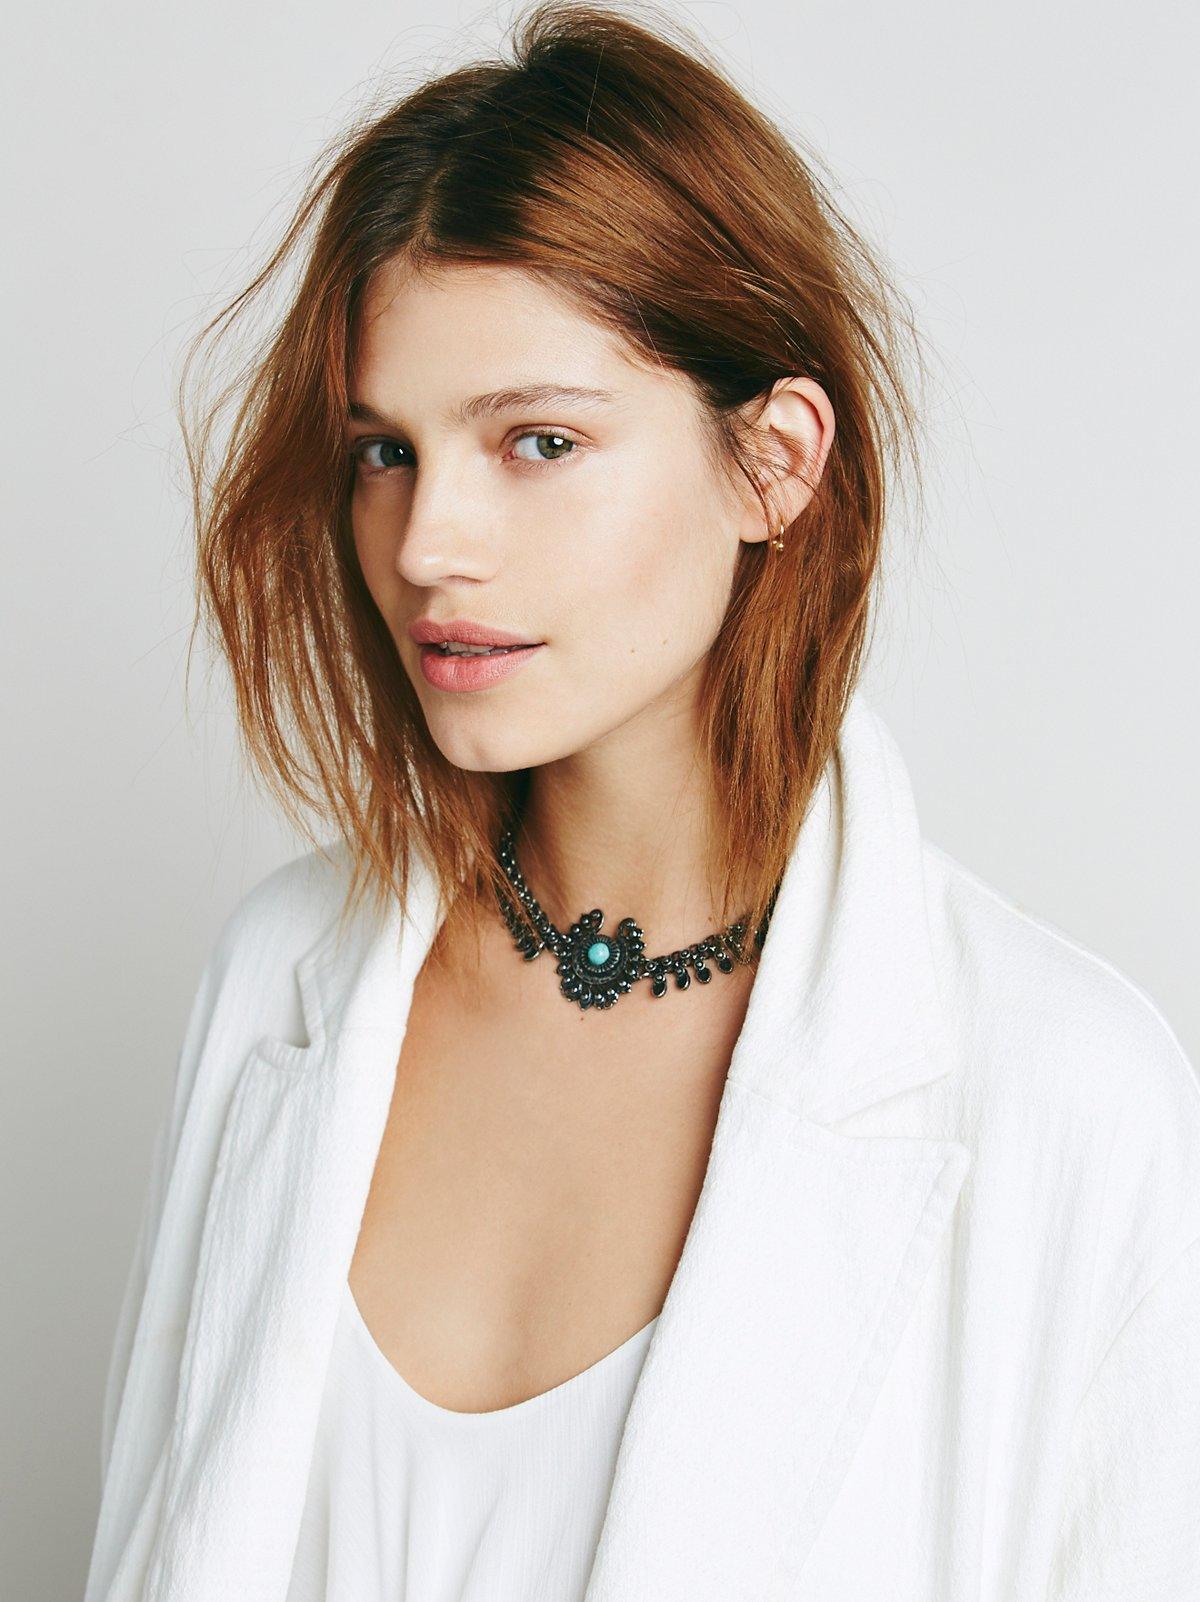 Marie金属颈链